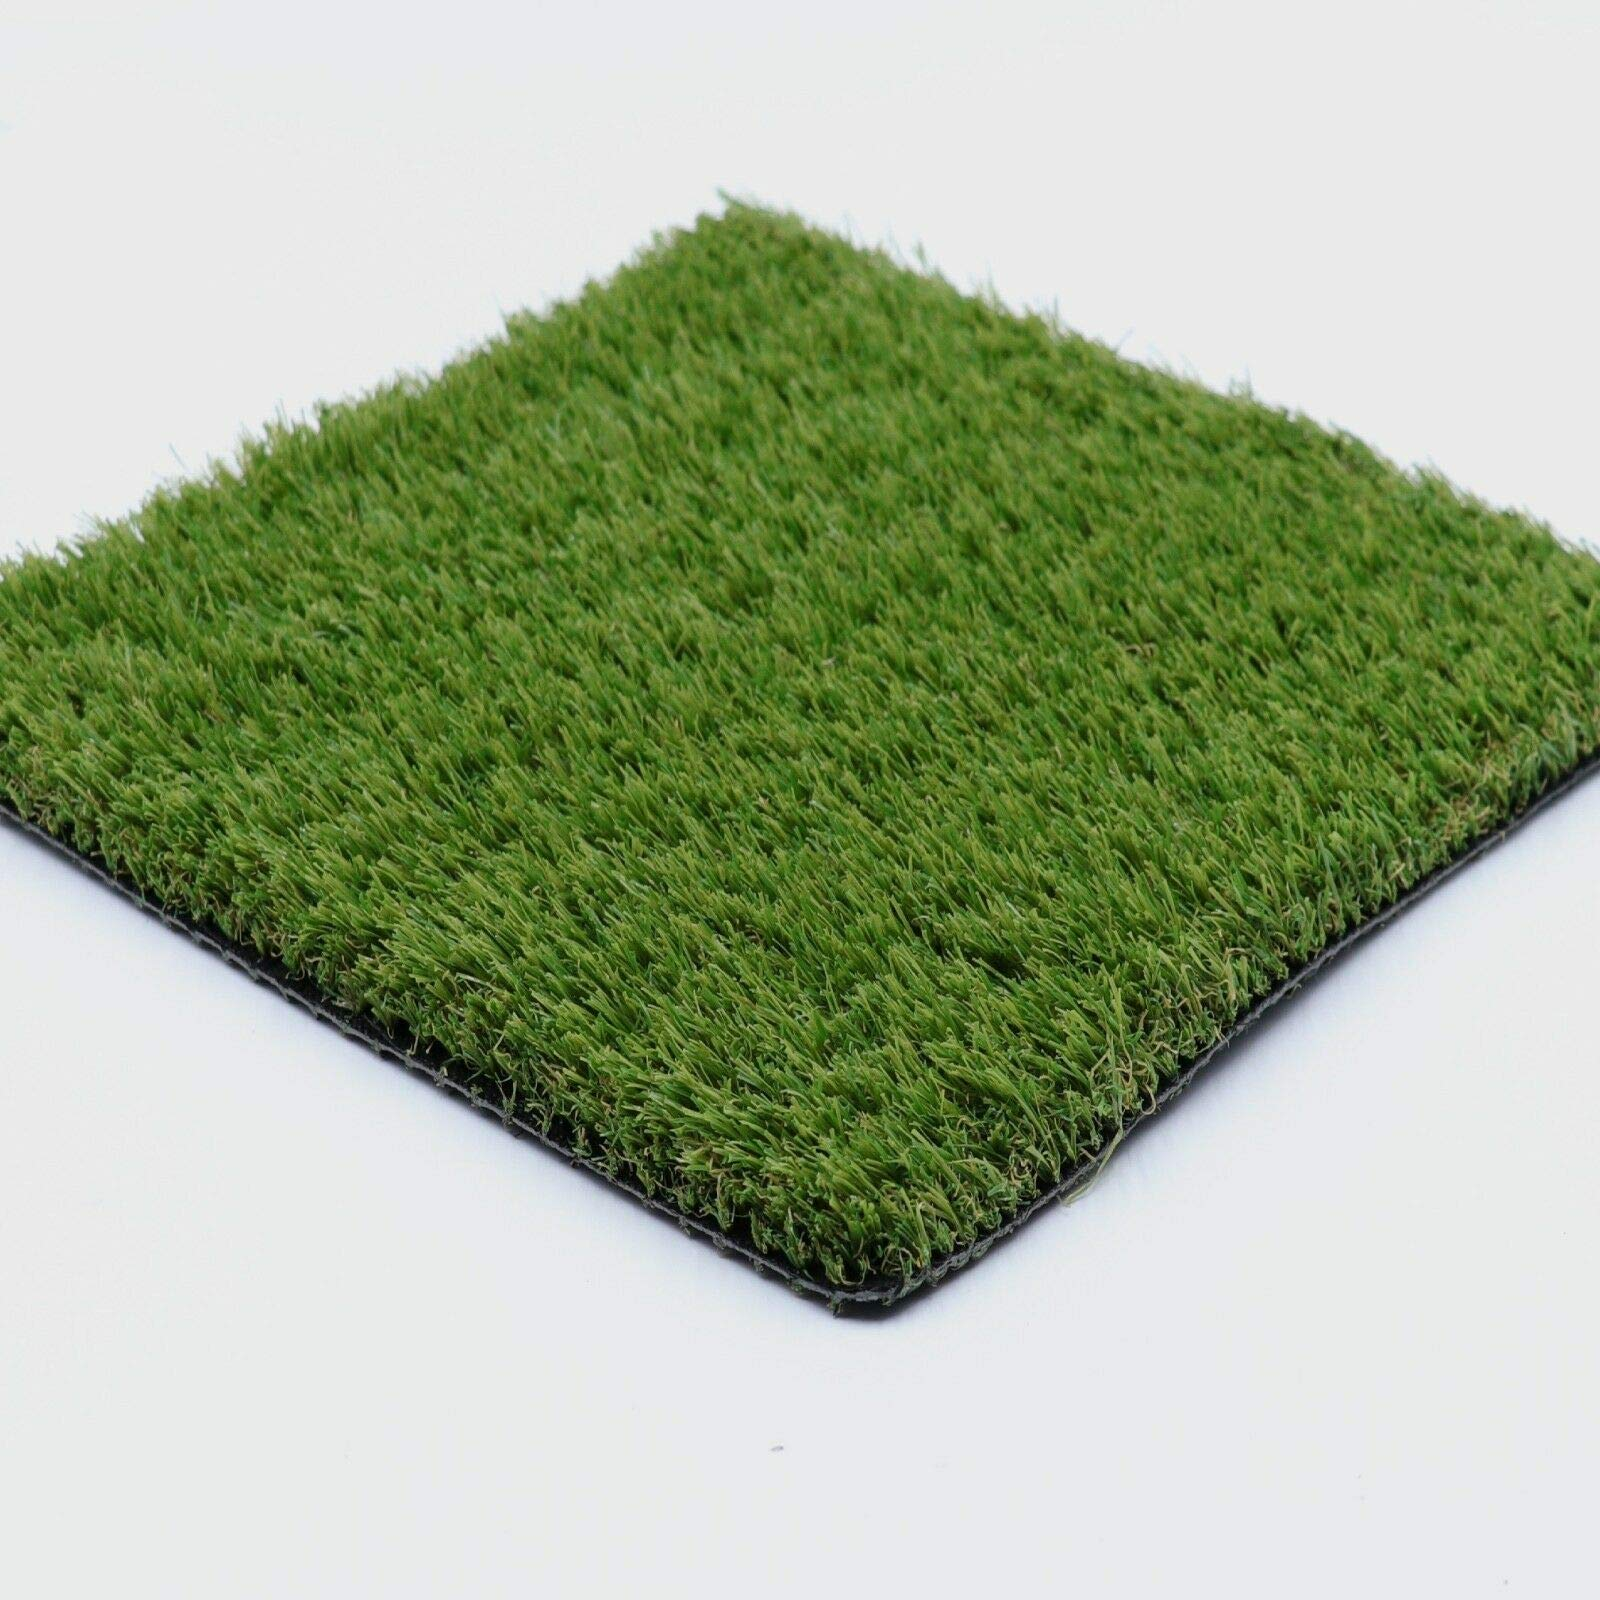 Coral 20mm Artificial Grass | 4 x 6m